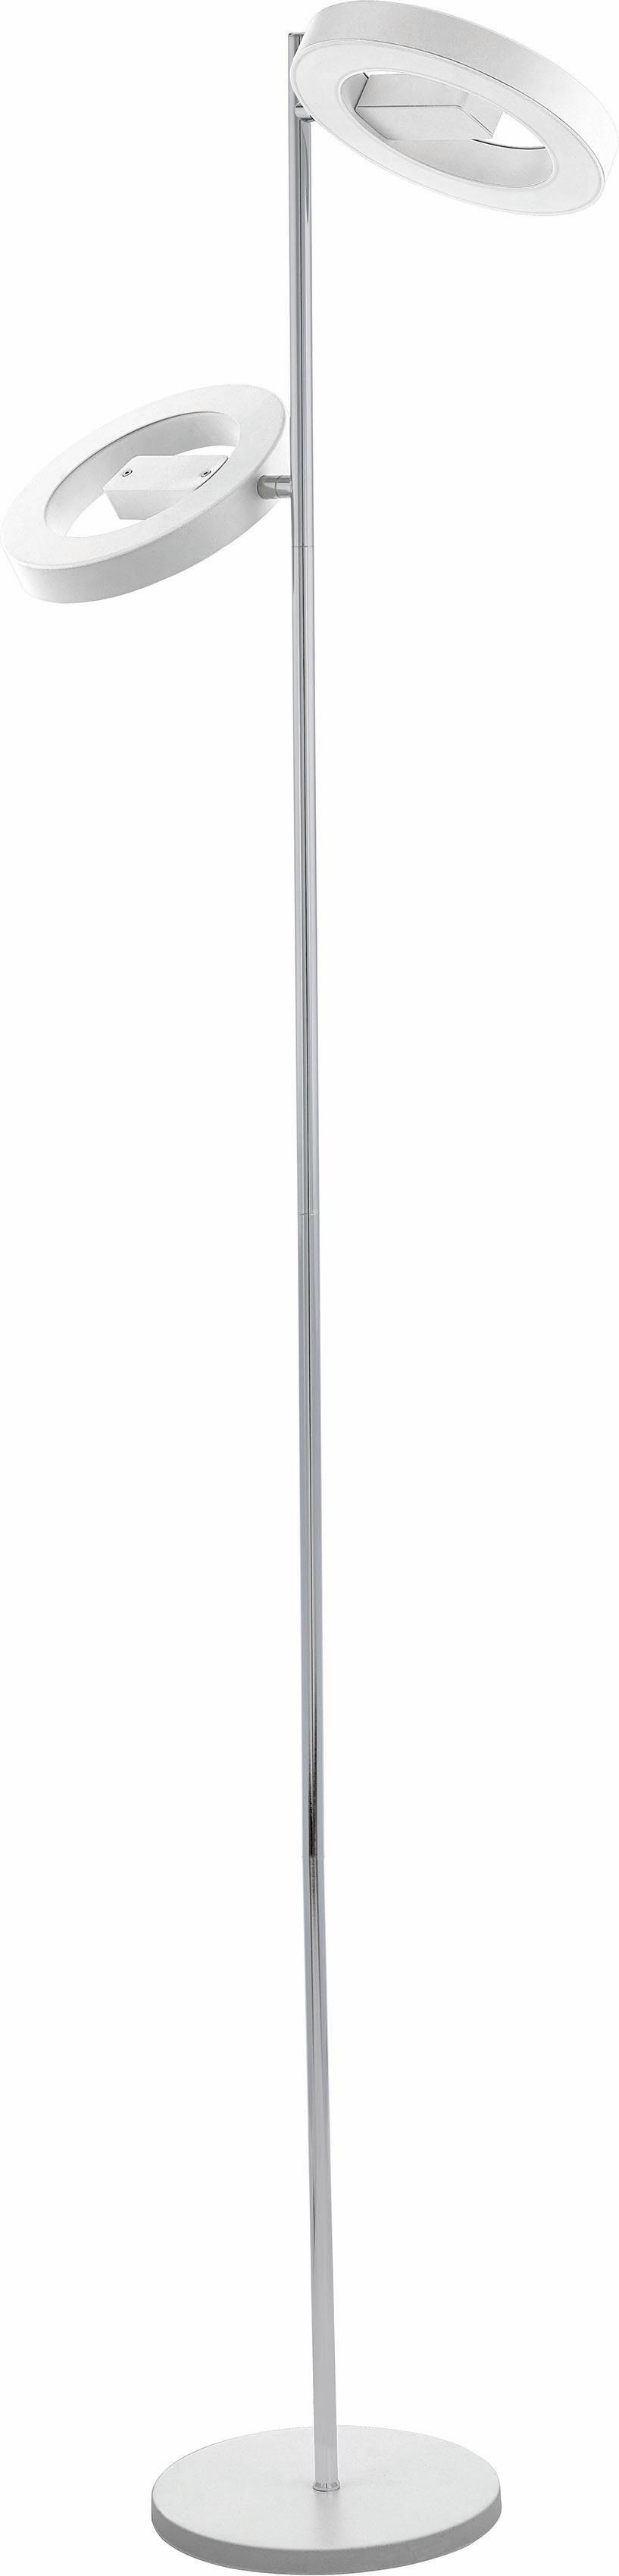 EGLO LED Stehlampe »ALVENDRE«, 2-flammig